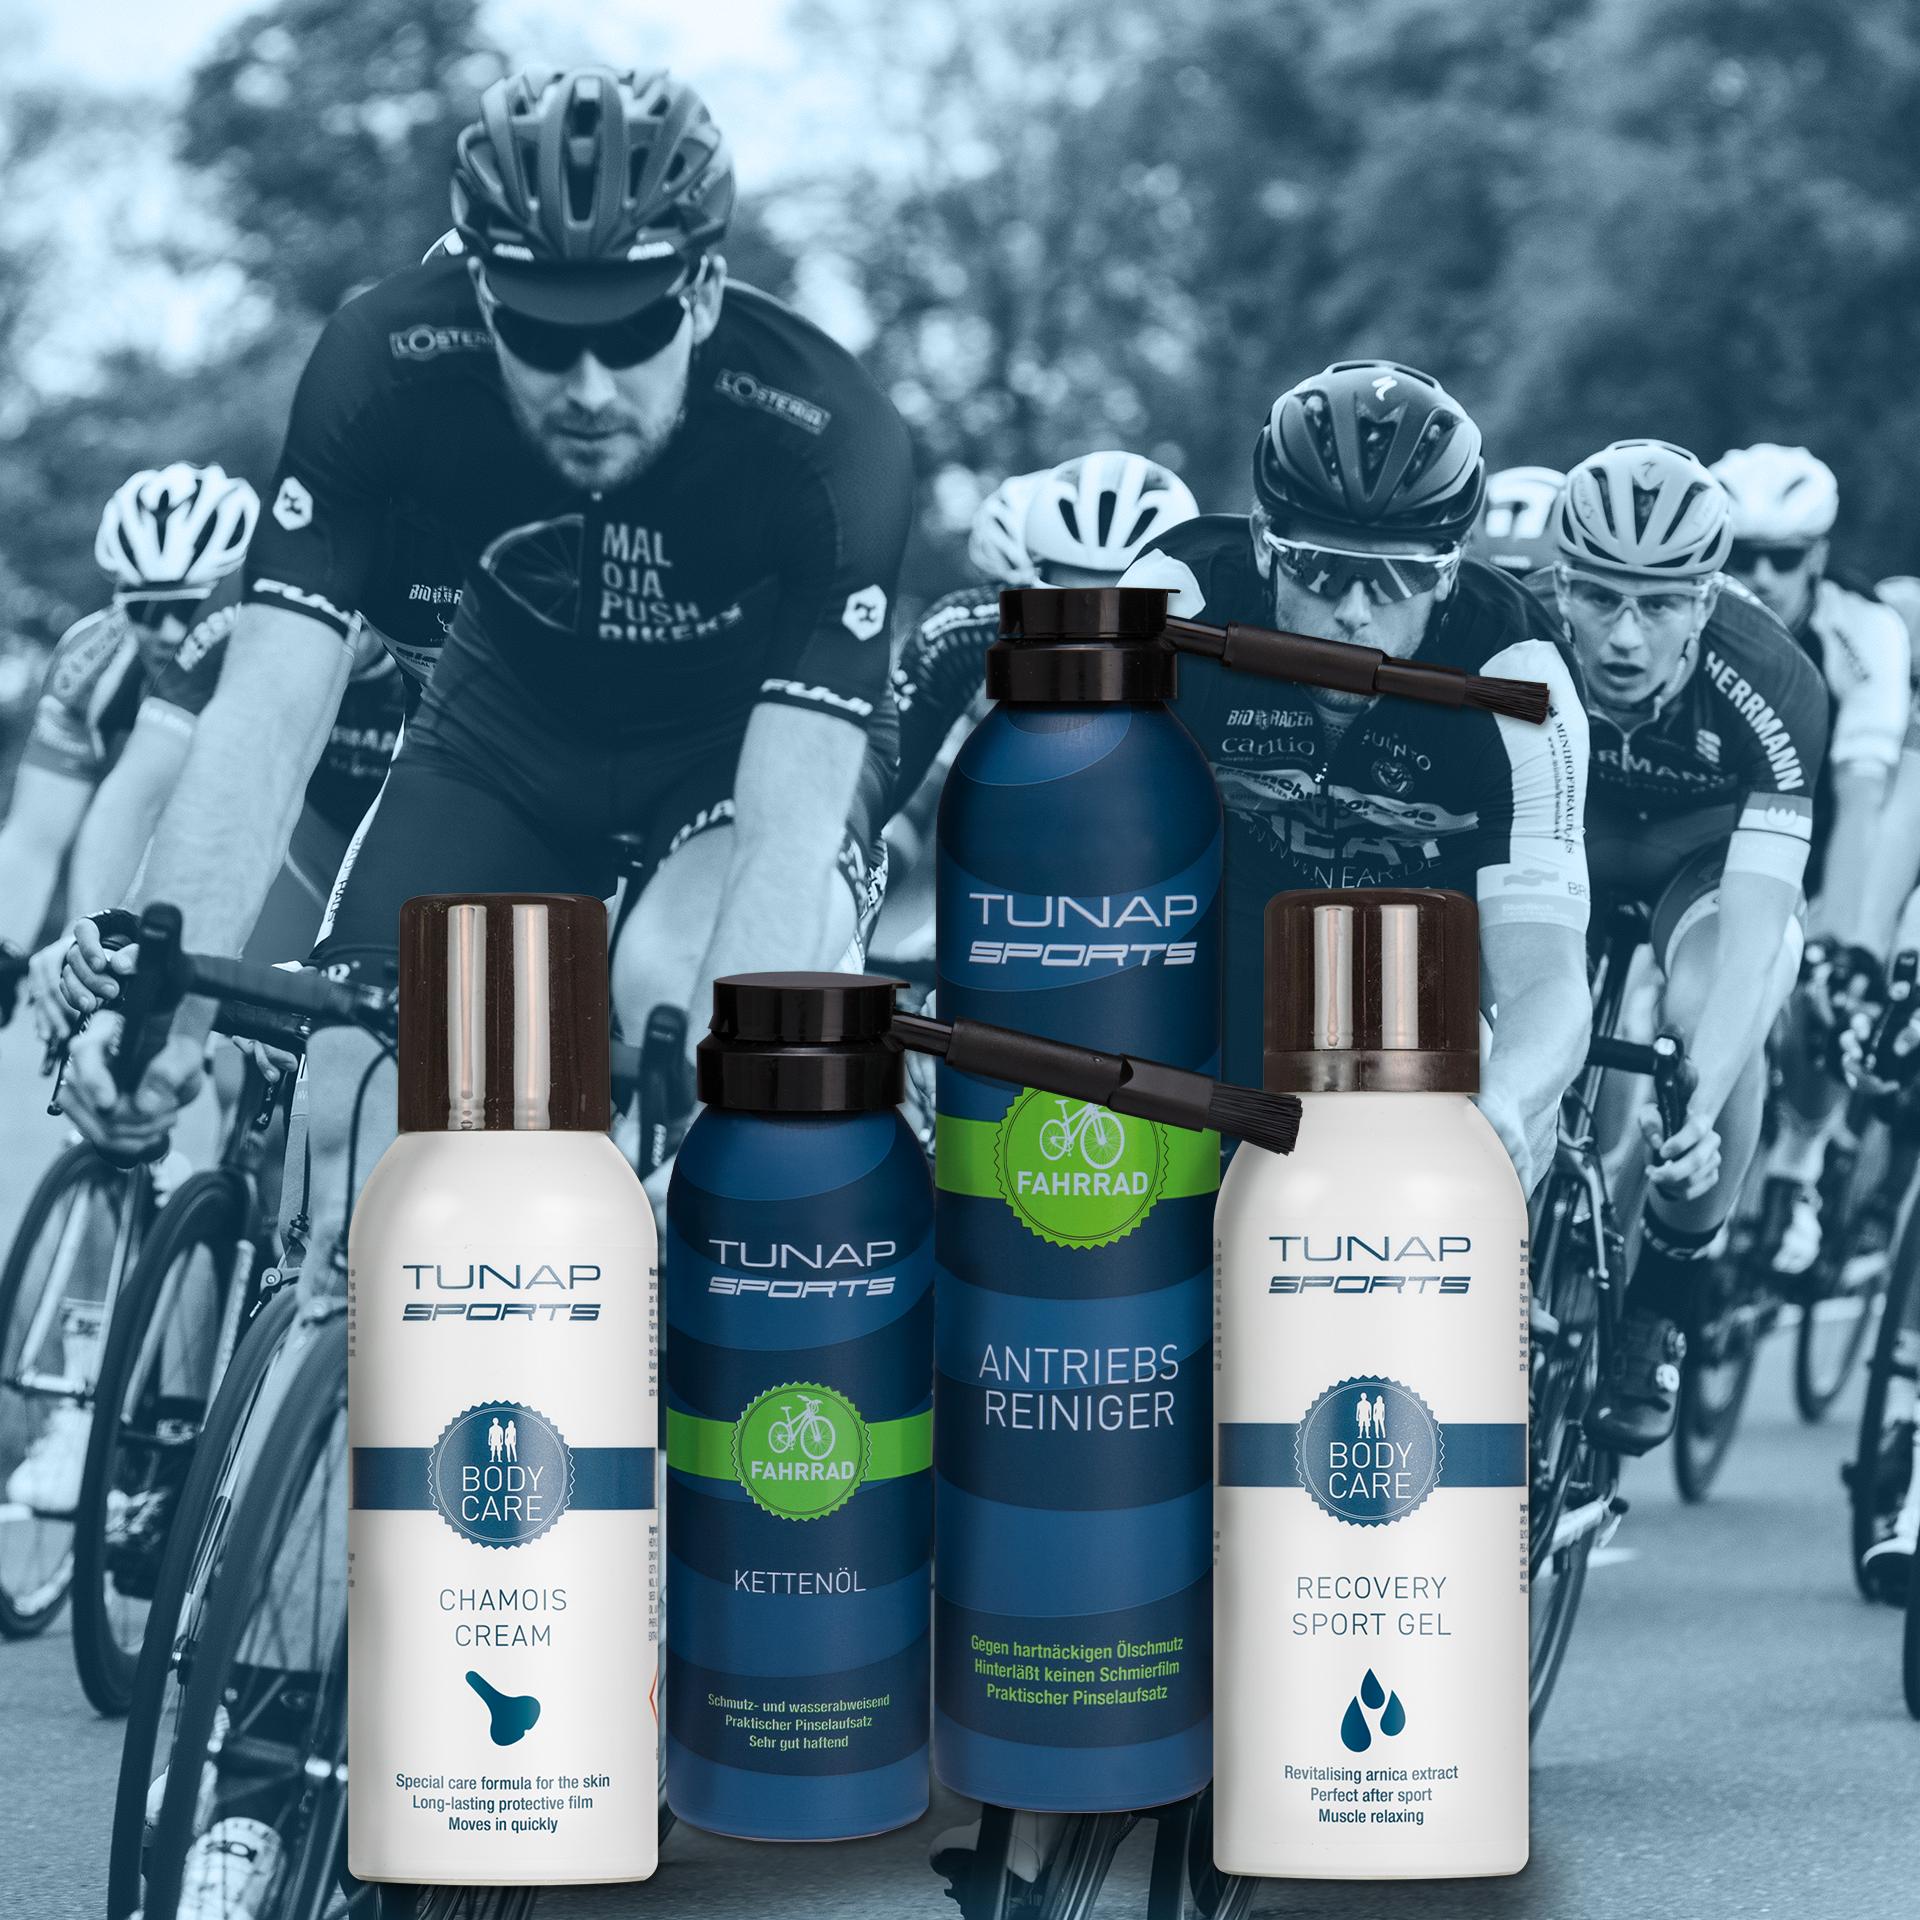 TUNAP Sports TUNAP Sports Bike & Body Gift Set - Copy - Copy - Copy